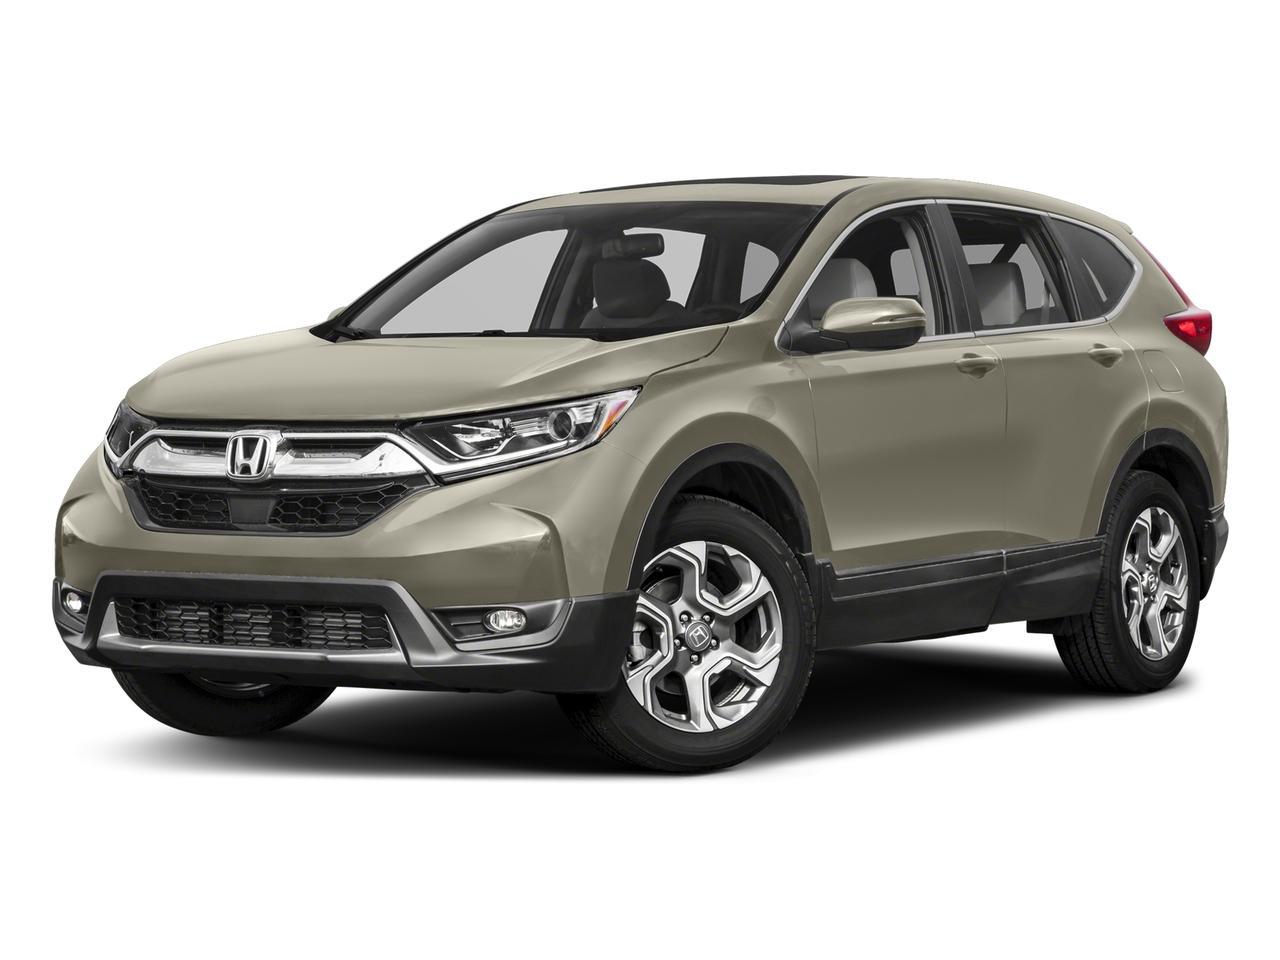 2017 Honda CR-V Vehicle Photo in San Antonio, TX 78257